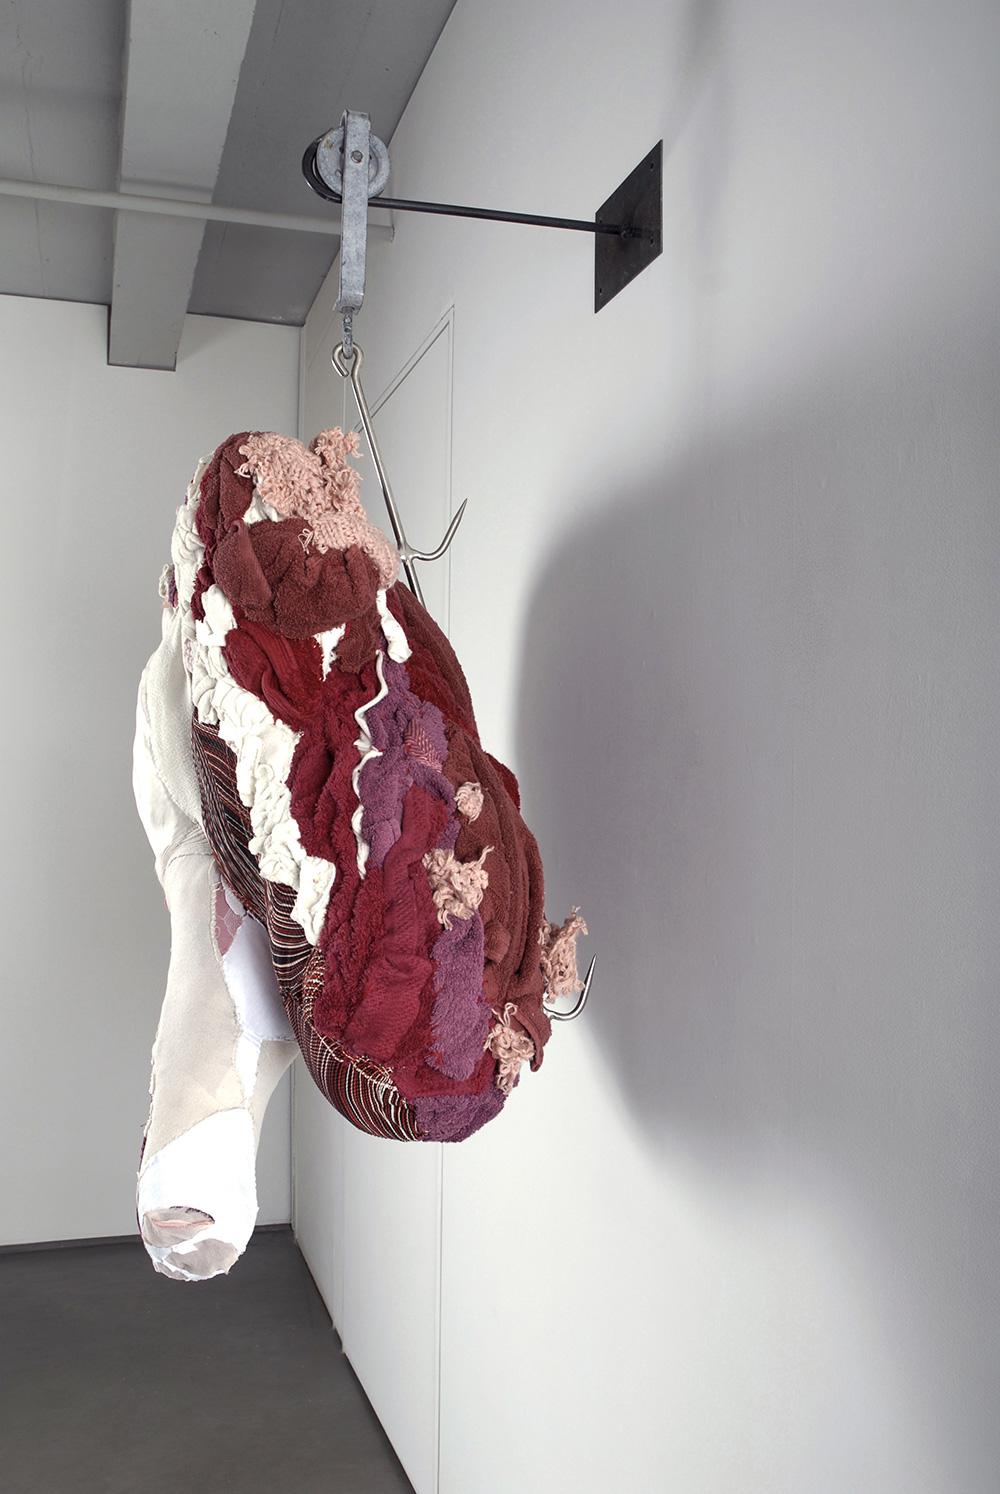 sculture-scarti-abiti-carcasse-animali-macello-actus-reus-tamara-kostianovsky-19